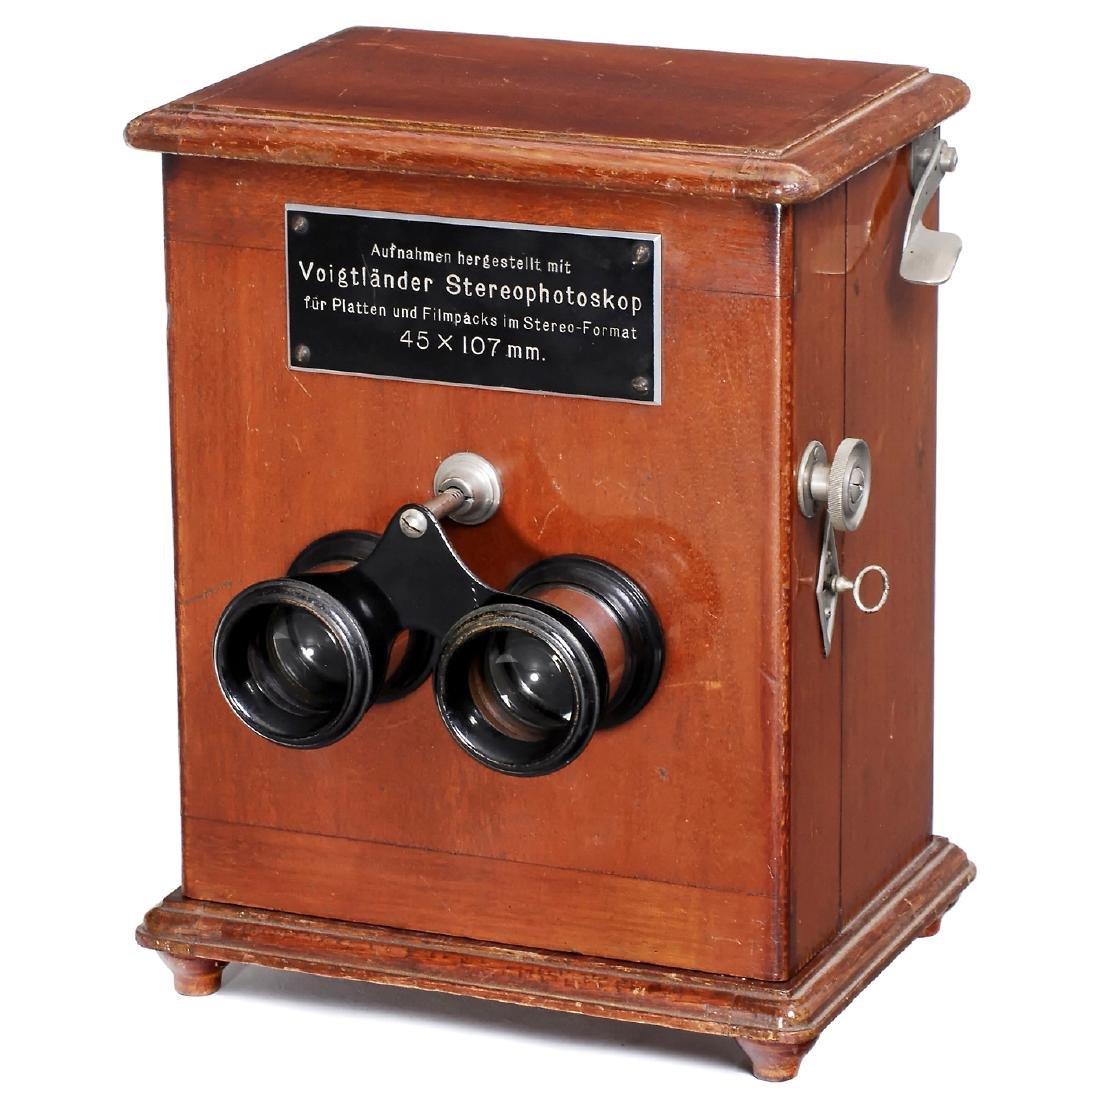 Voigtländer Stereophotoskop 45 x 107, c. 1910